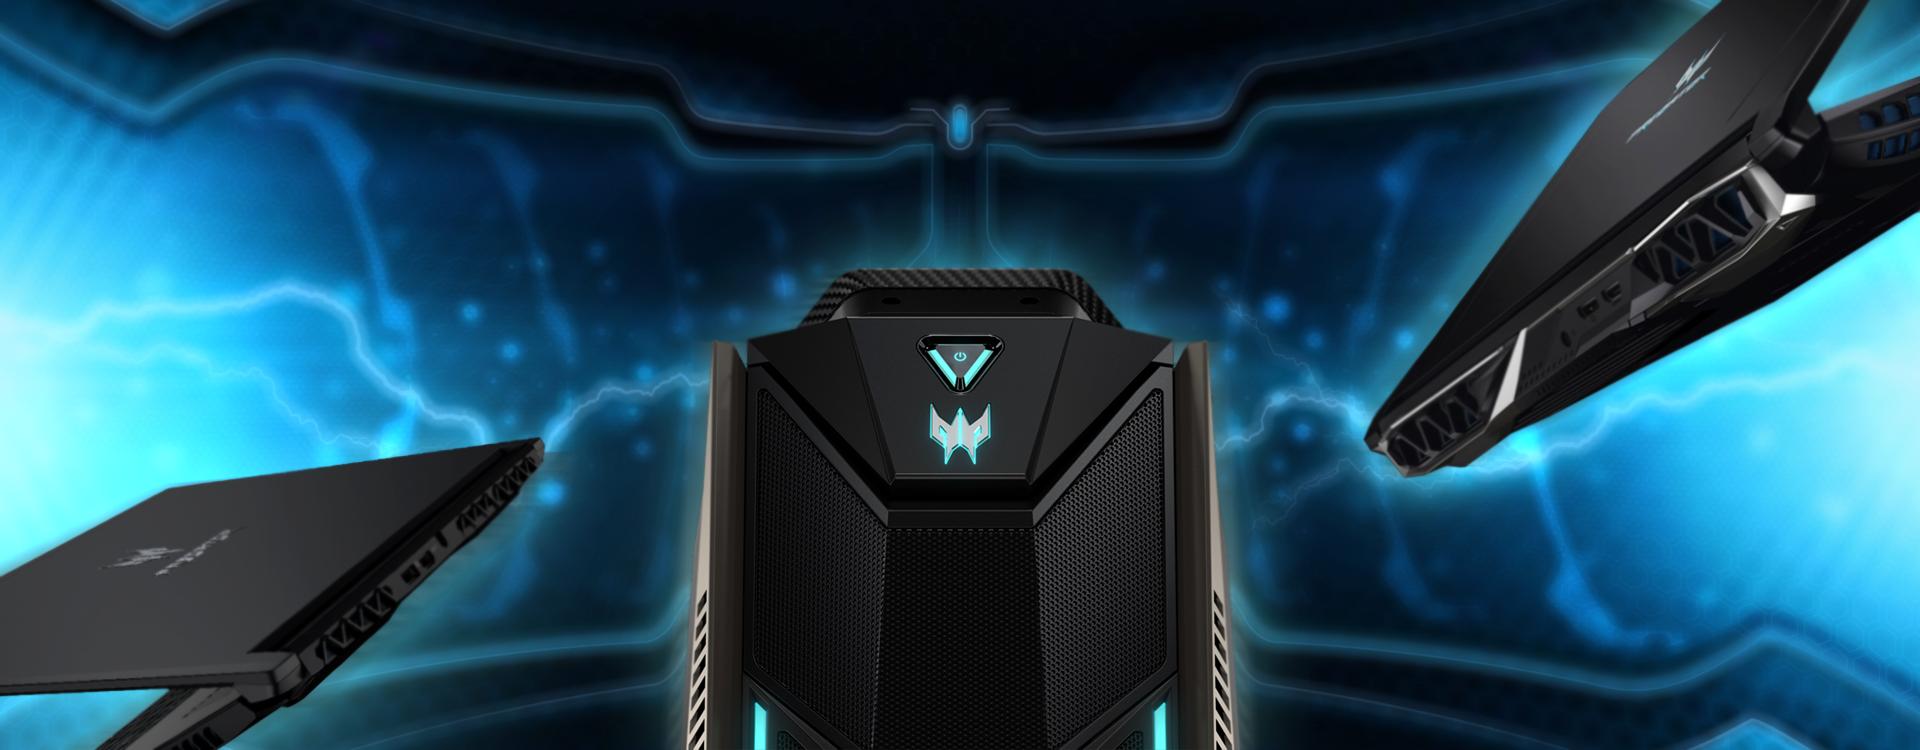 predator gaming computer